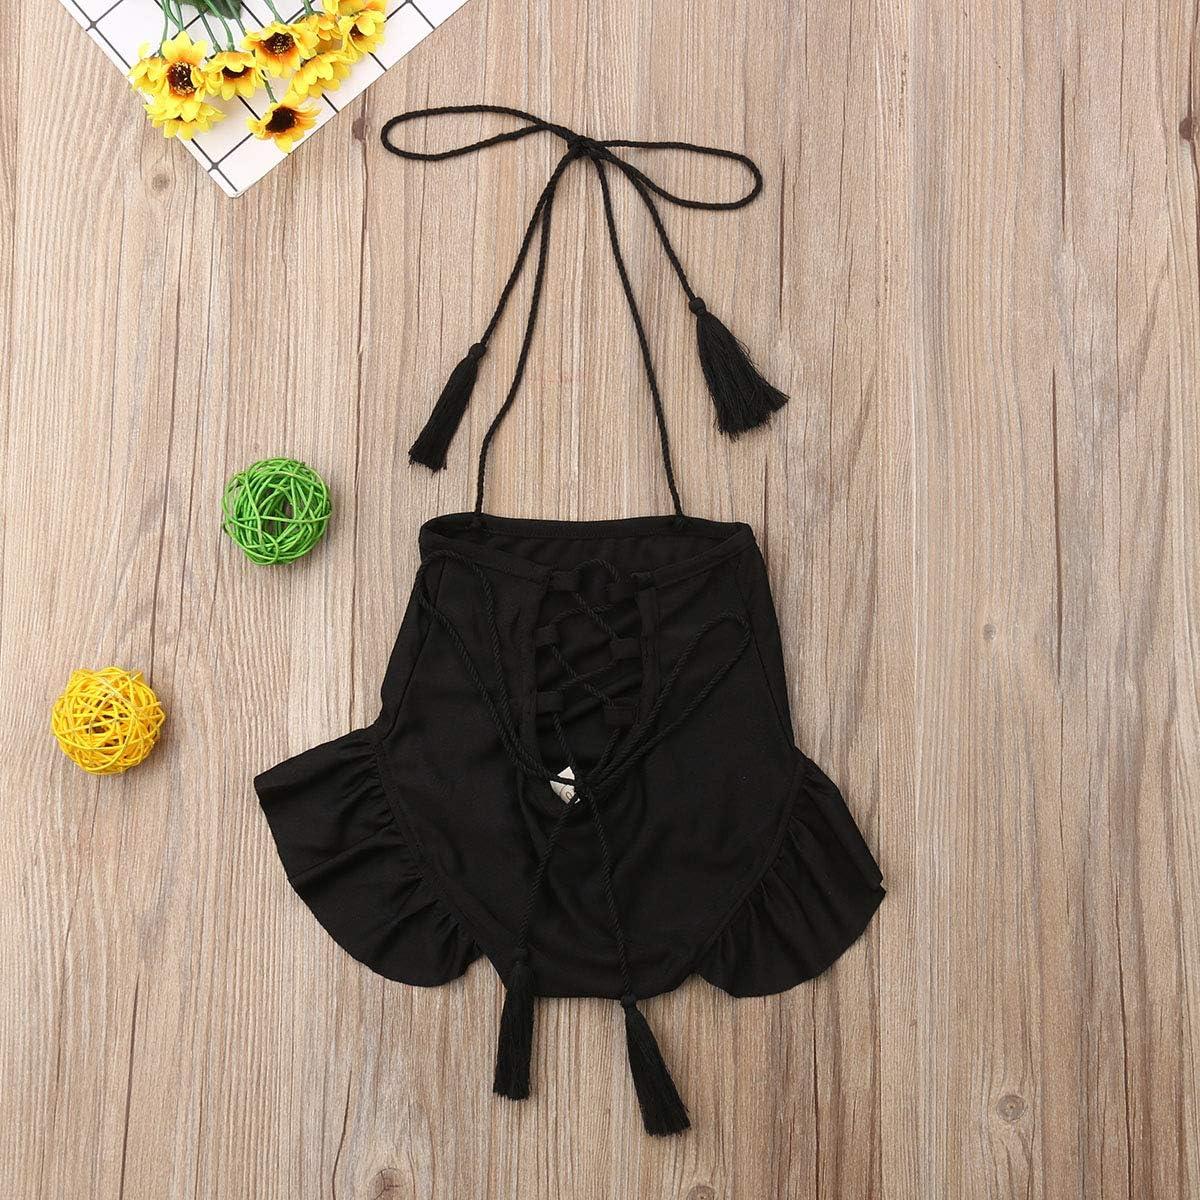 Turuste Newborn Baby Girls Swimsuits One-Piece Halter Neck Backless Beachwear Black Bandage Swimwear Bathing Suit